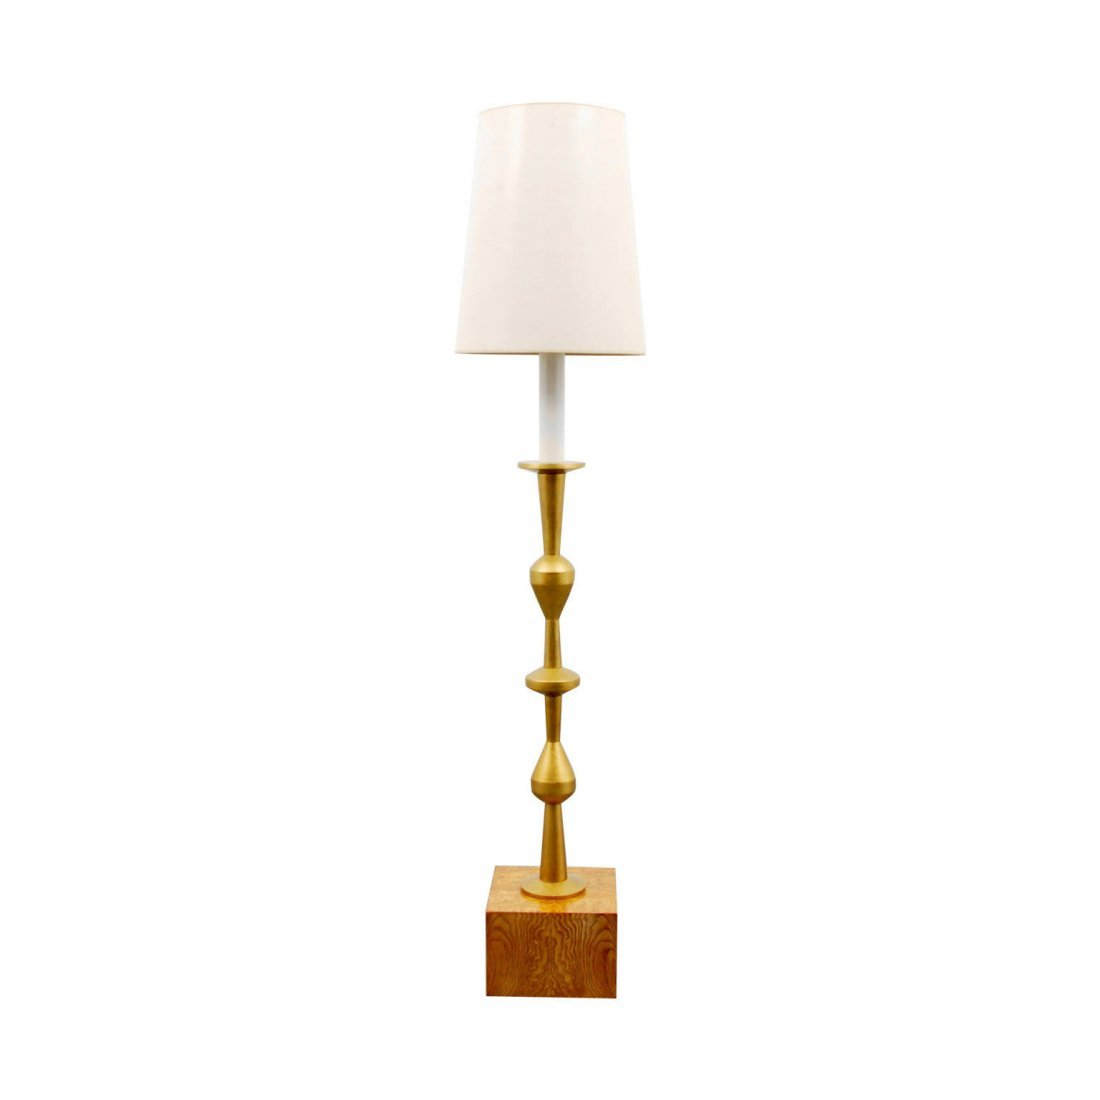 Rare Tommi Parzinger Floor Lamp - 3